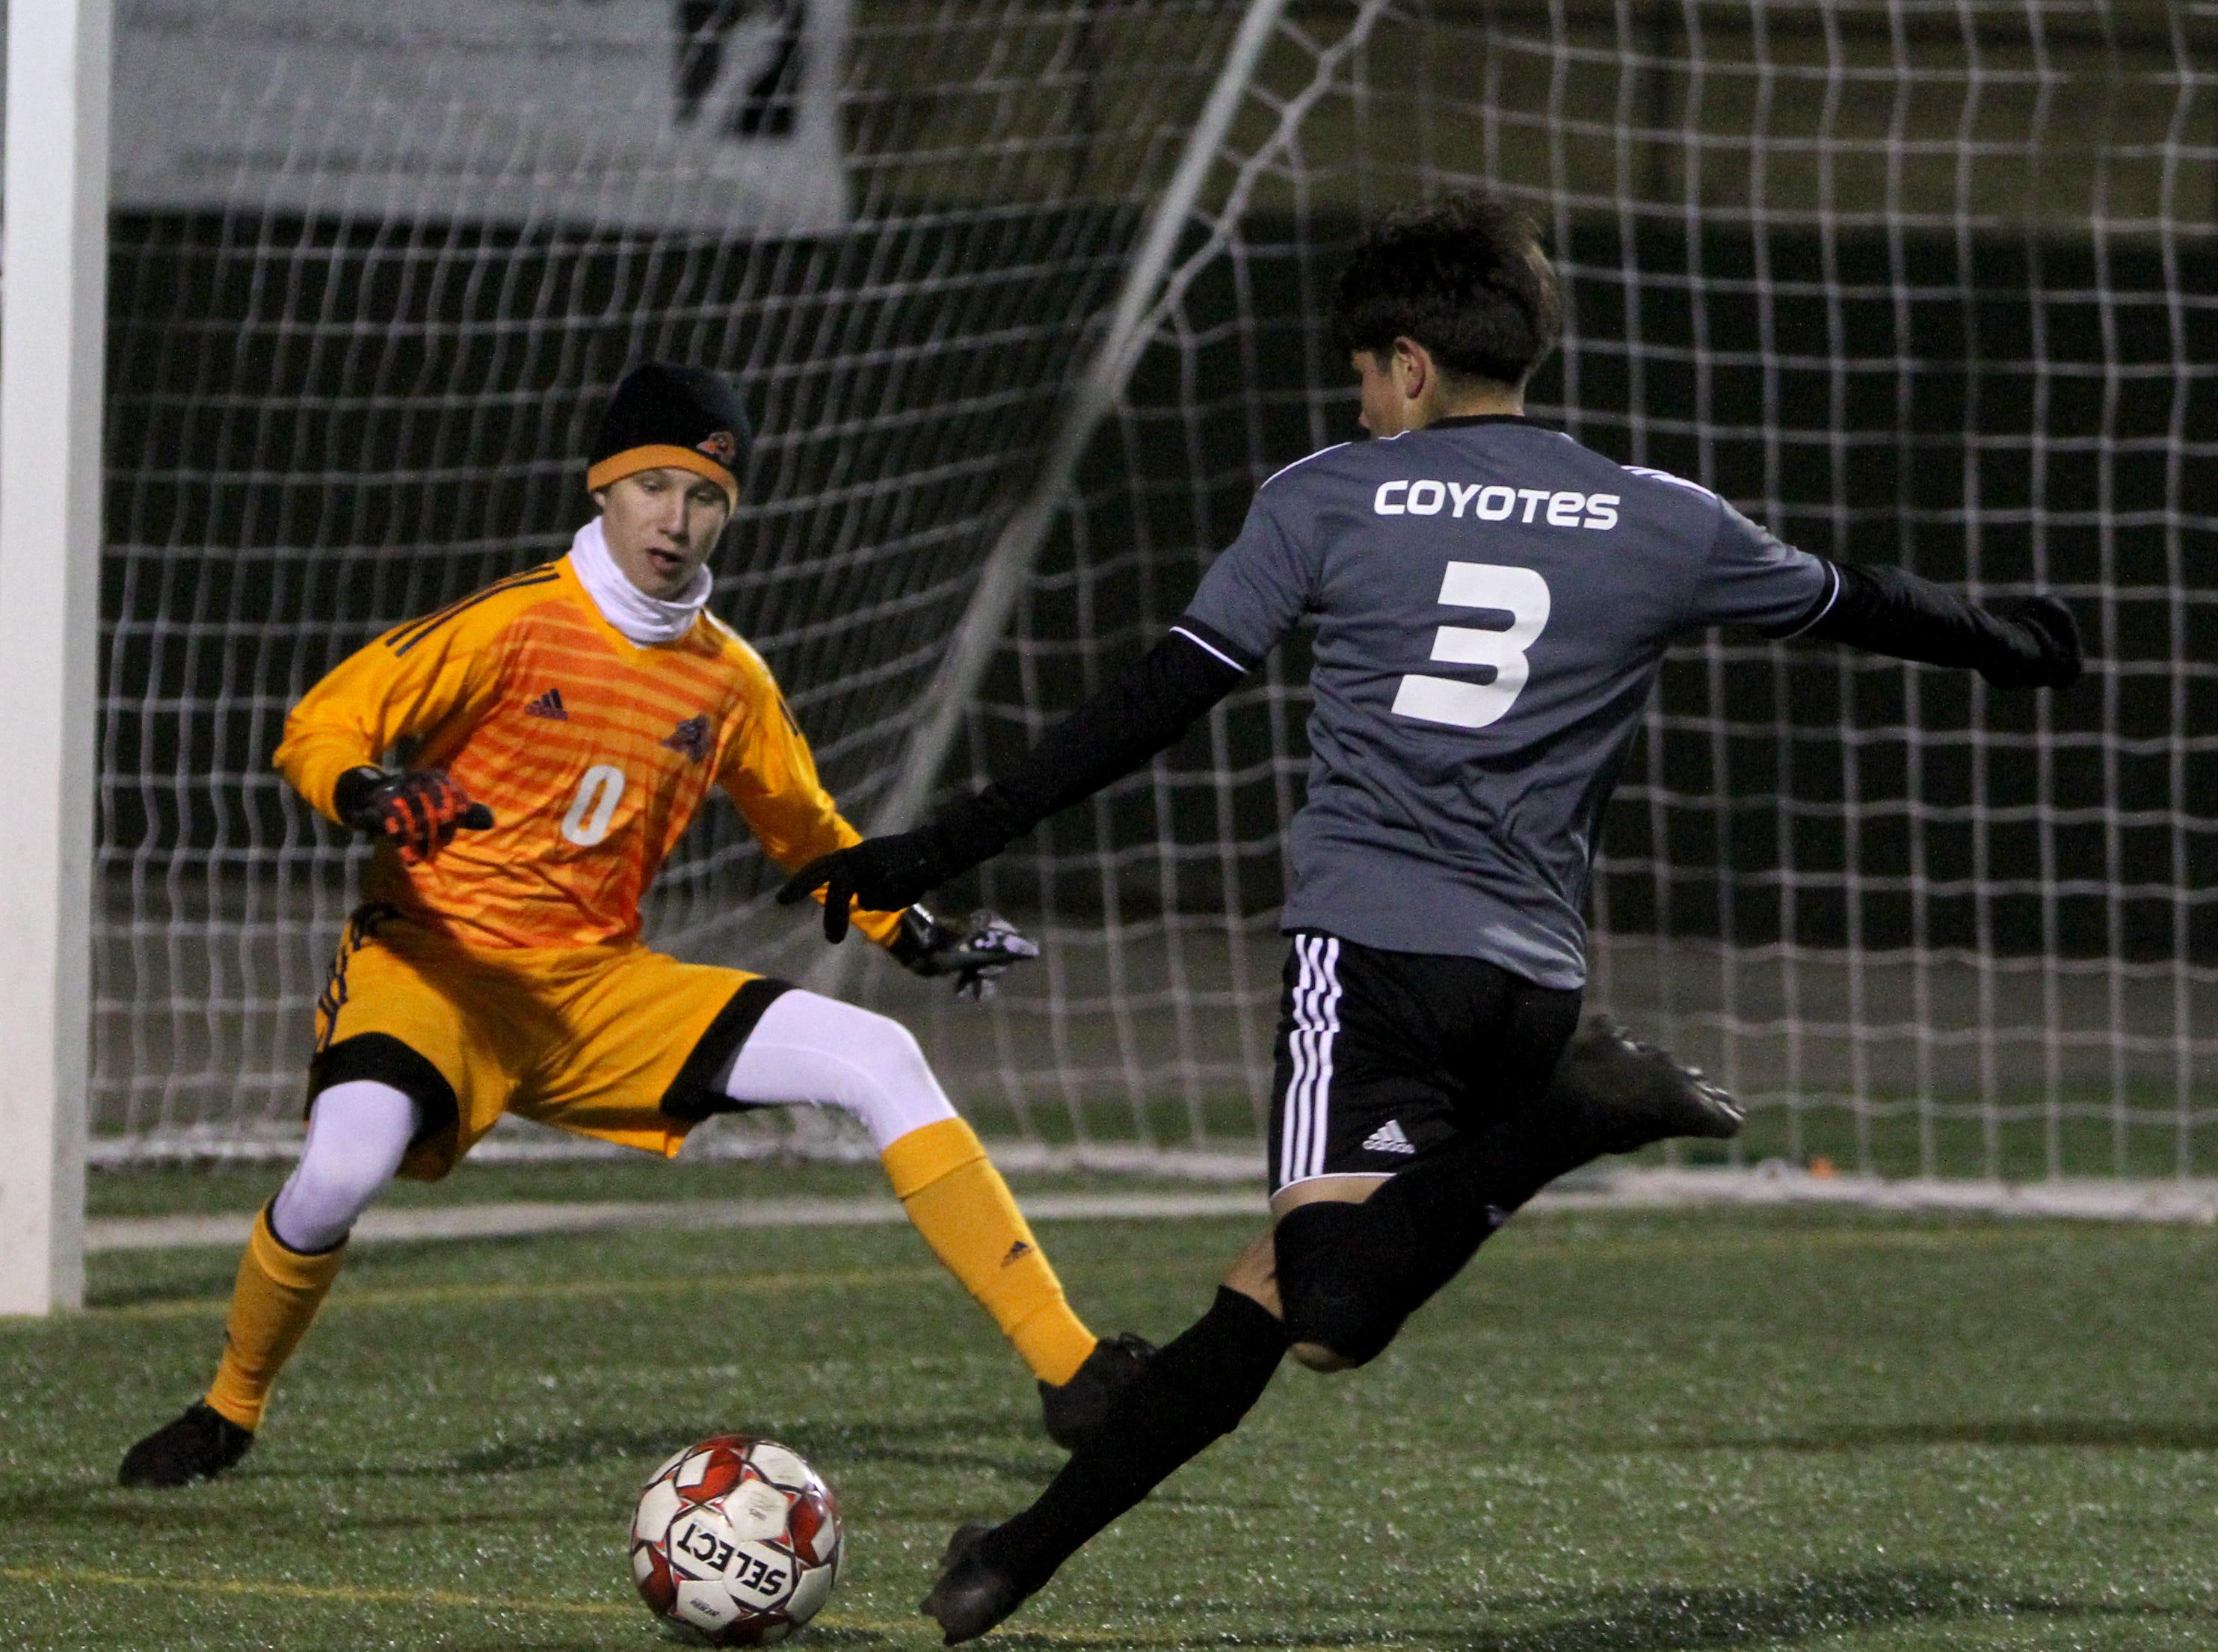 Wichita Falls High School's Taylor Davis fakes a kick by Aledo goalie Ryland Oaks Tuesday, March 5, 2019, at Memorial Stadium.